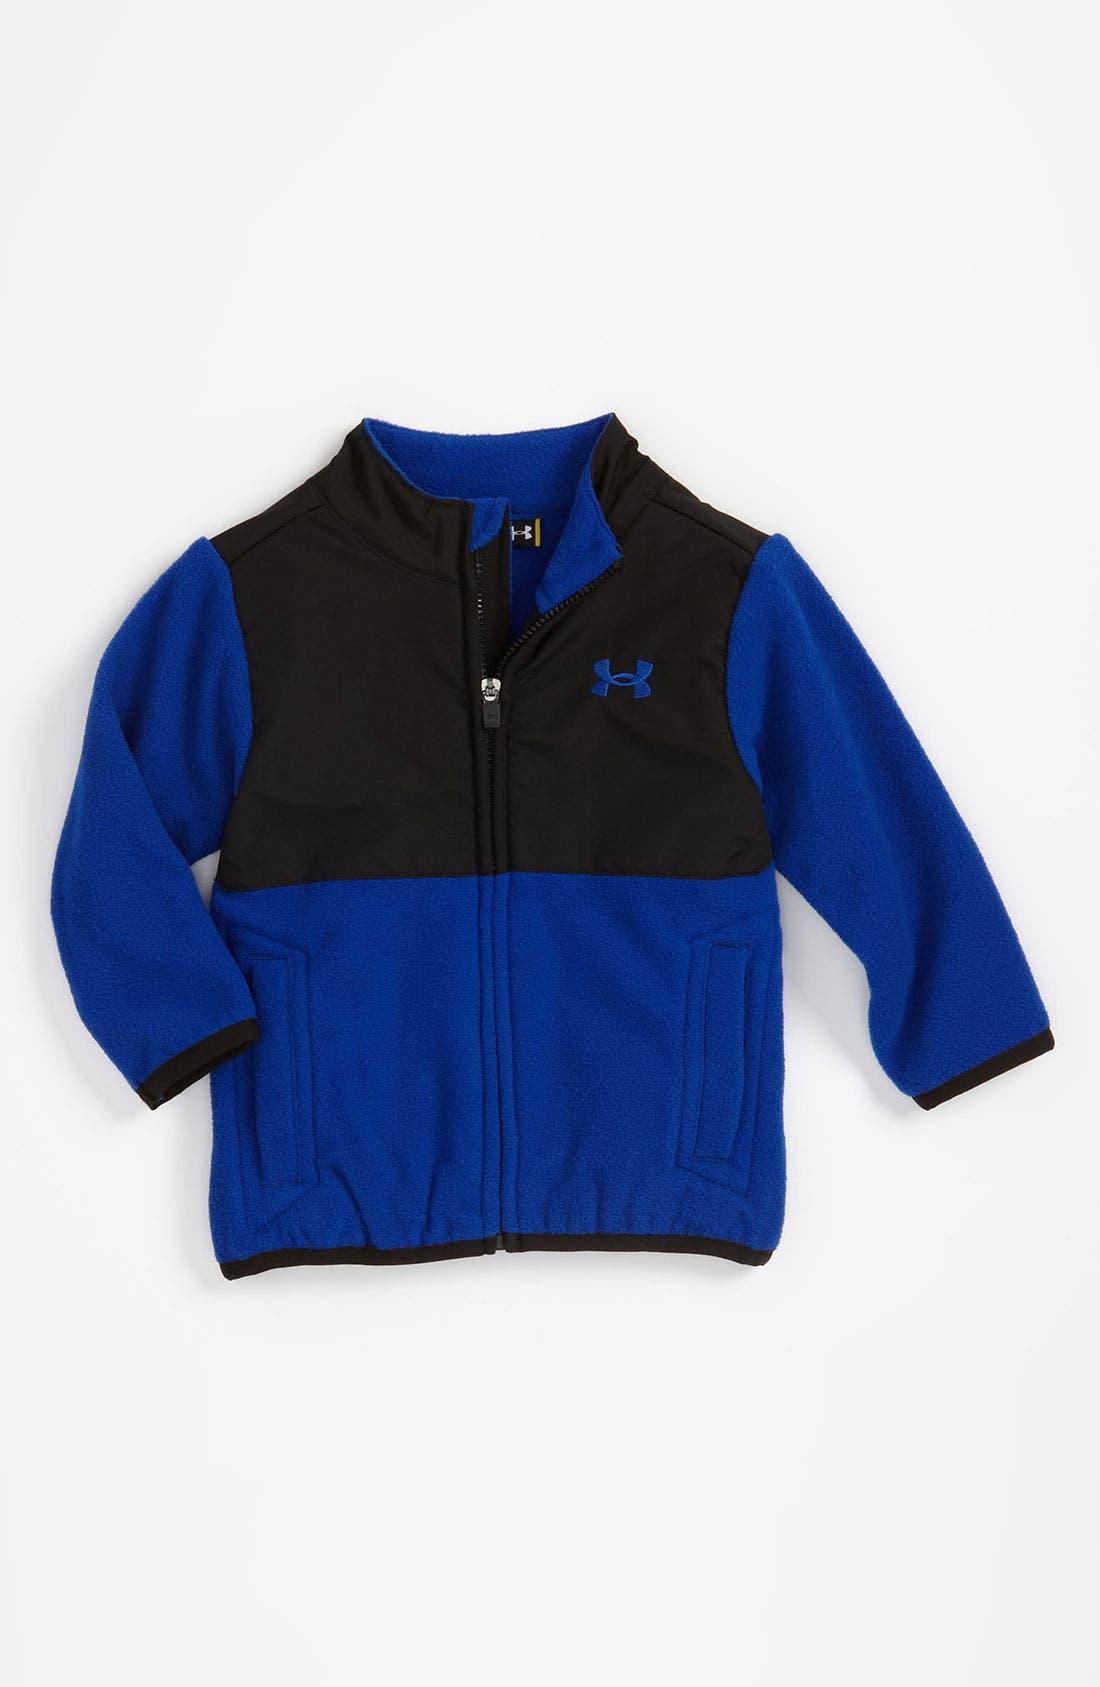 Alternate Image 1 Selected - Under Armour Fleece Jacket (Toddler)